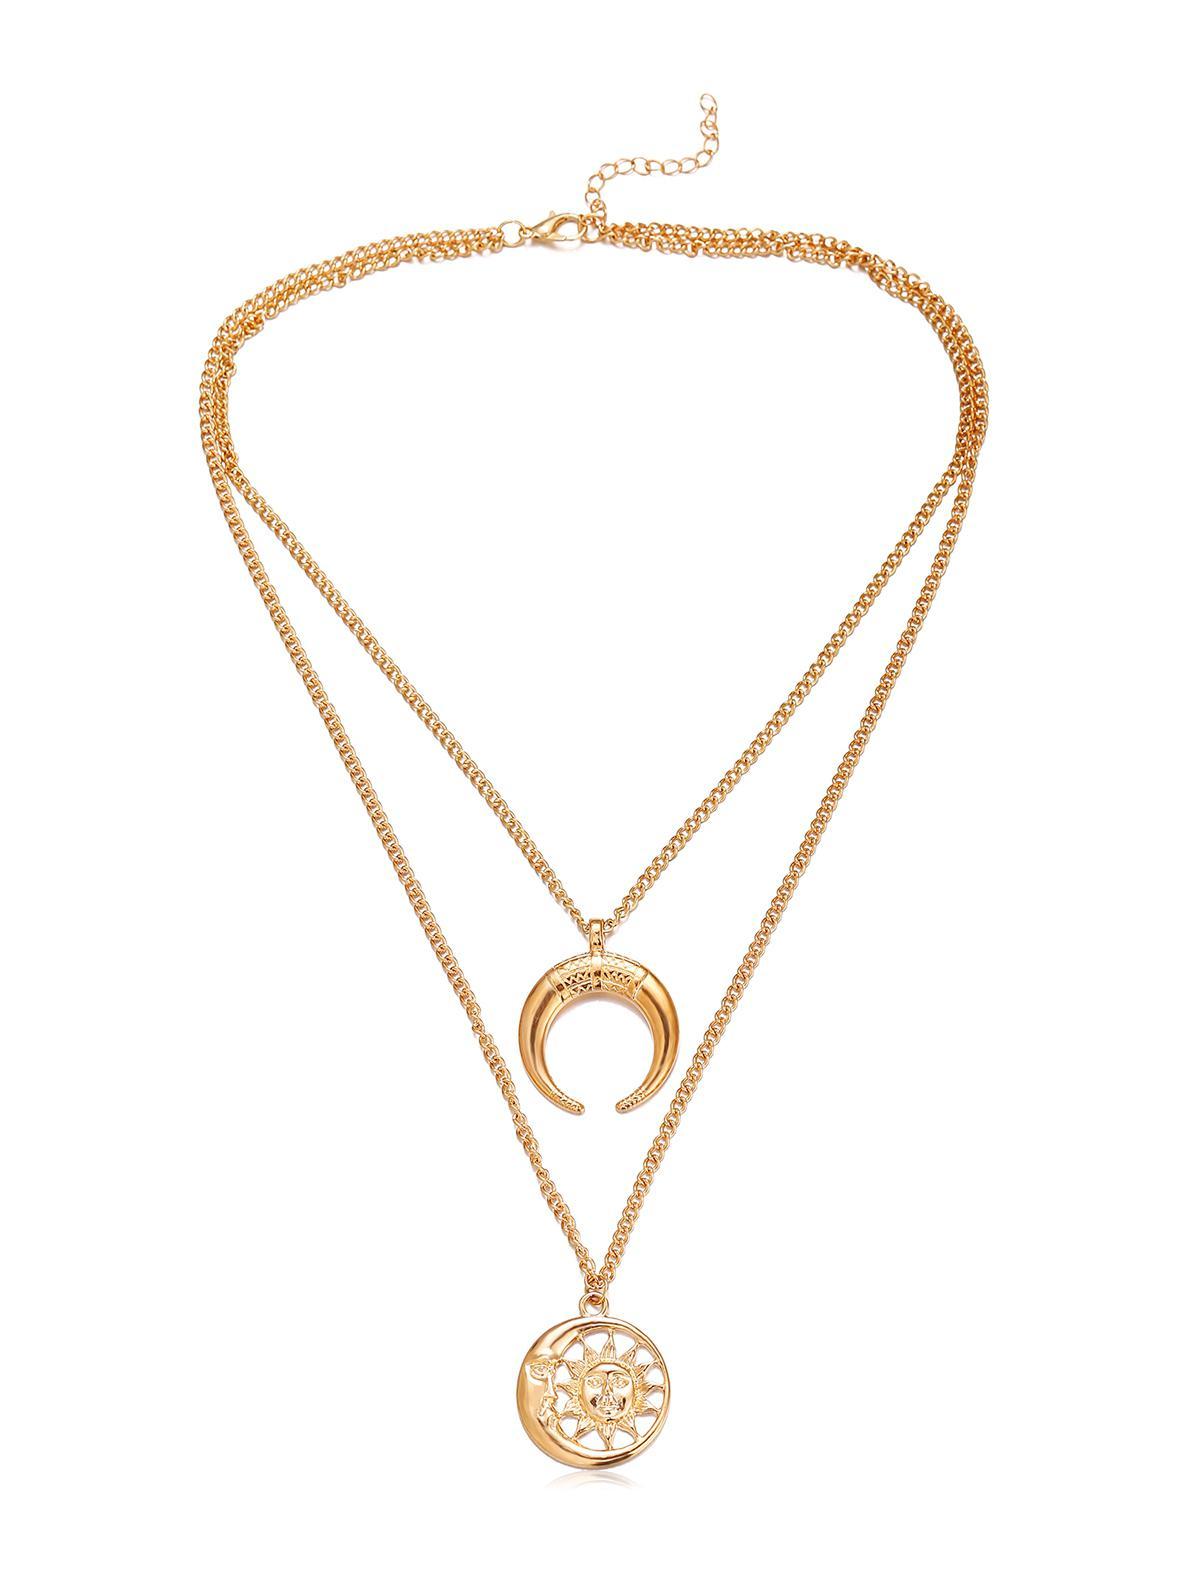 Crescent Moon Sun Pendant Necklace, Gold